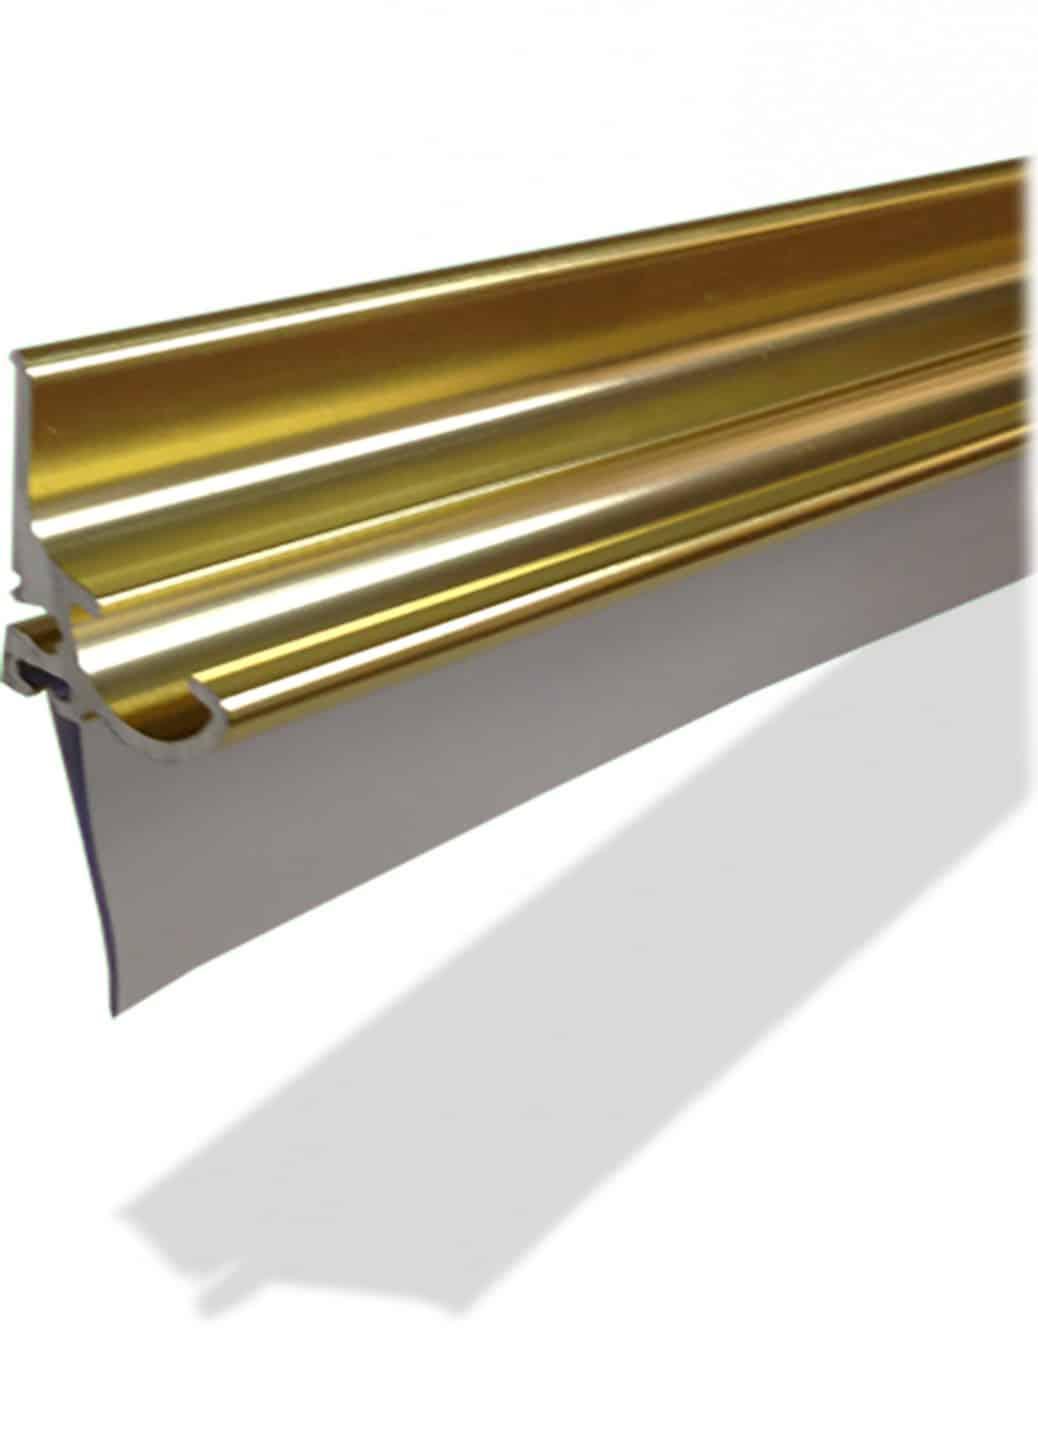 How to replace shower door drip rail - Ds202 Shower Glass Door Metal Drip Rail Leaking Seal Wipe Replacement Quality Pfokus 1038x1451 Jpg